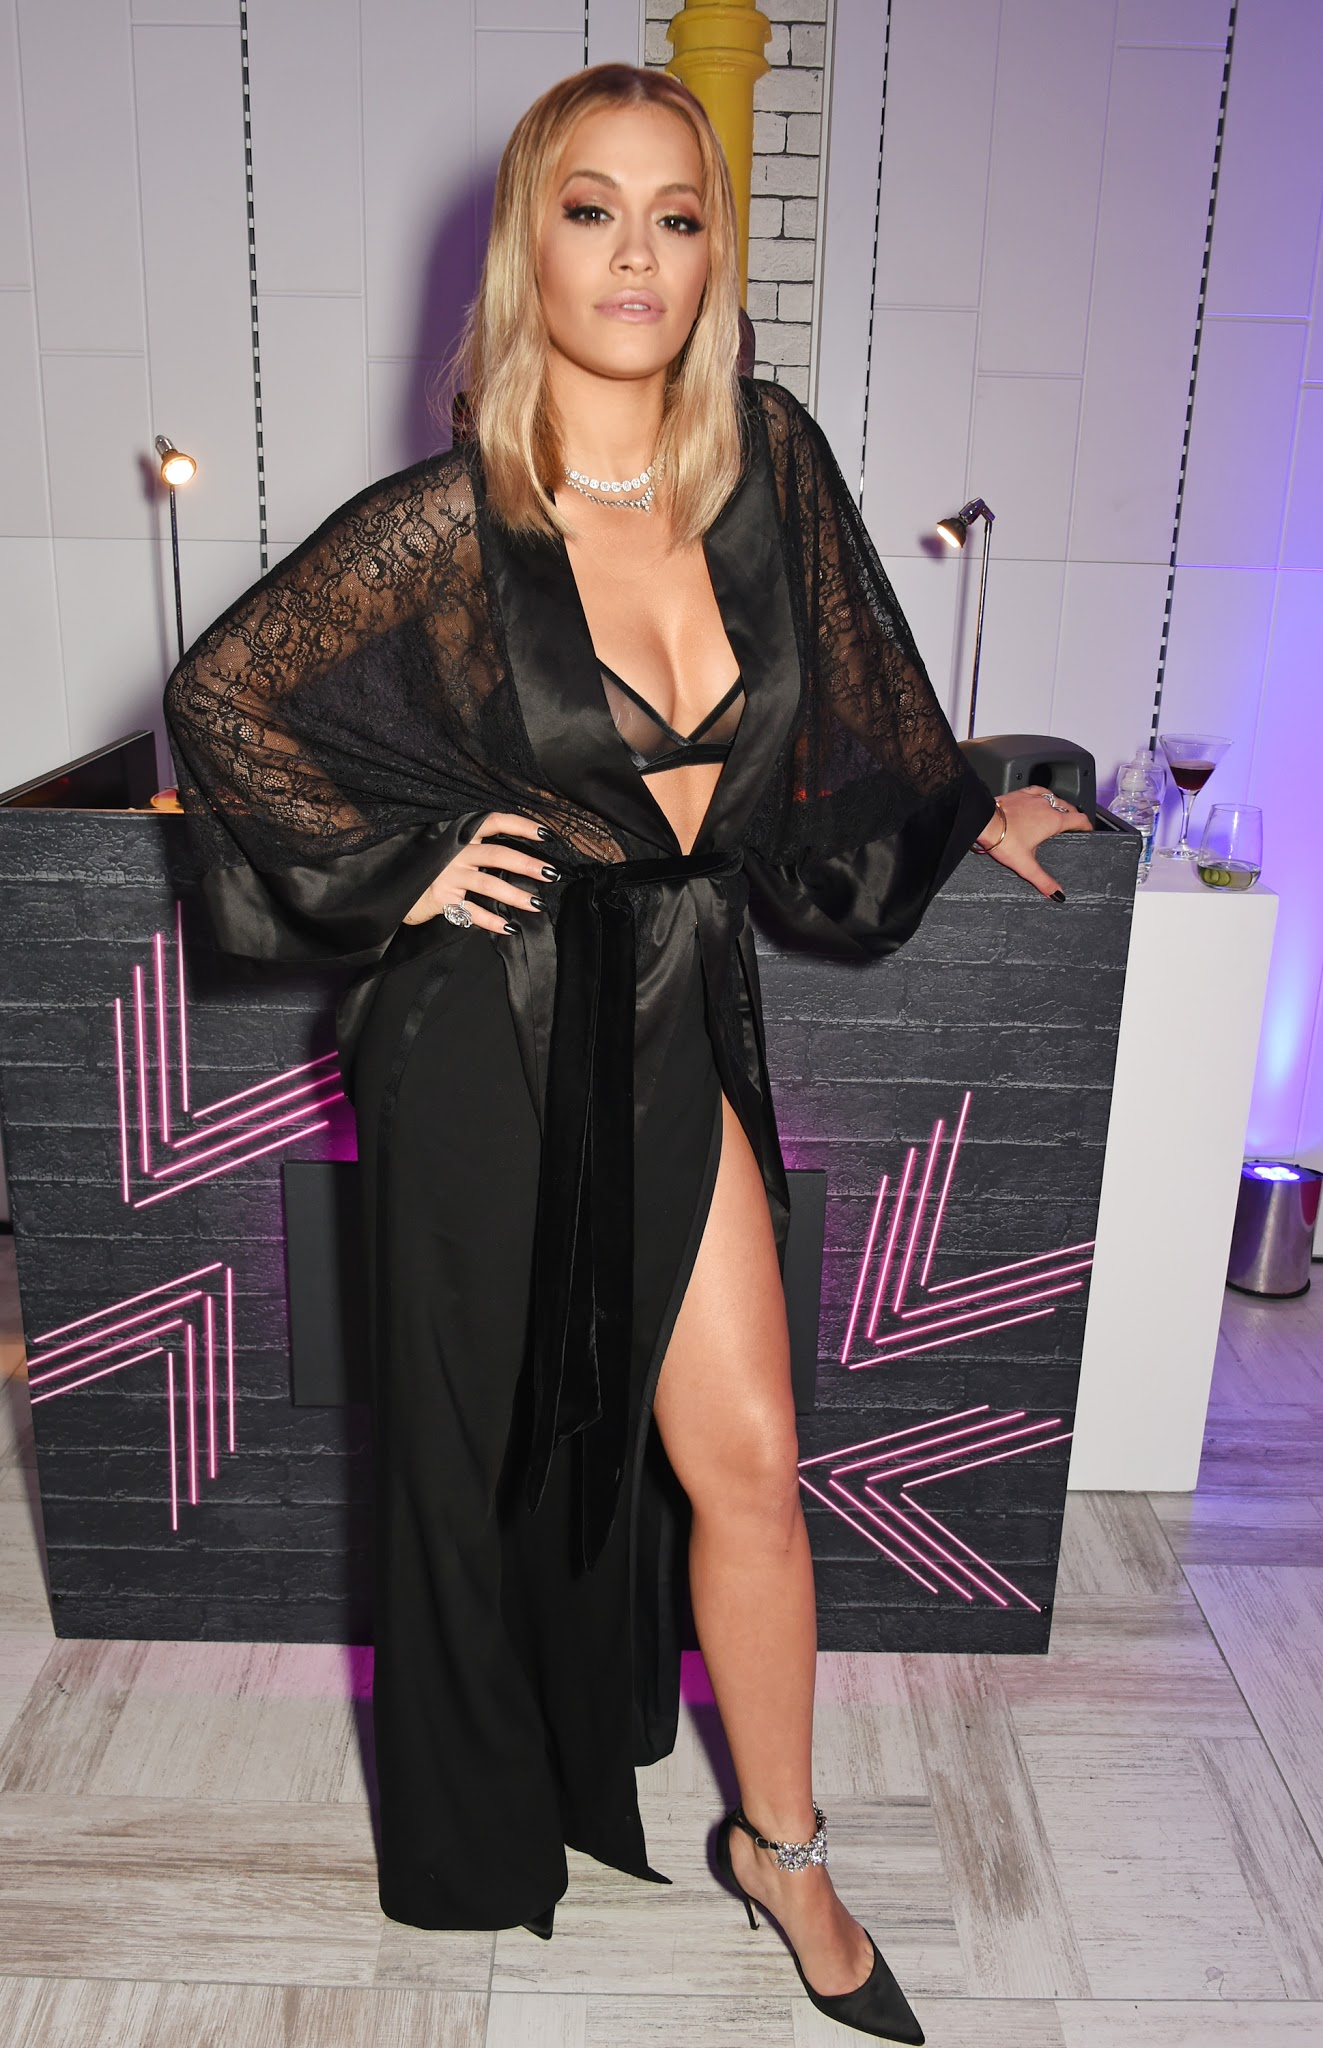 butt Cleavage Rita Ora naked photo 2017